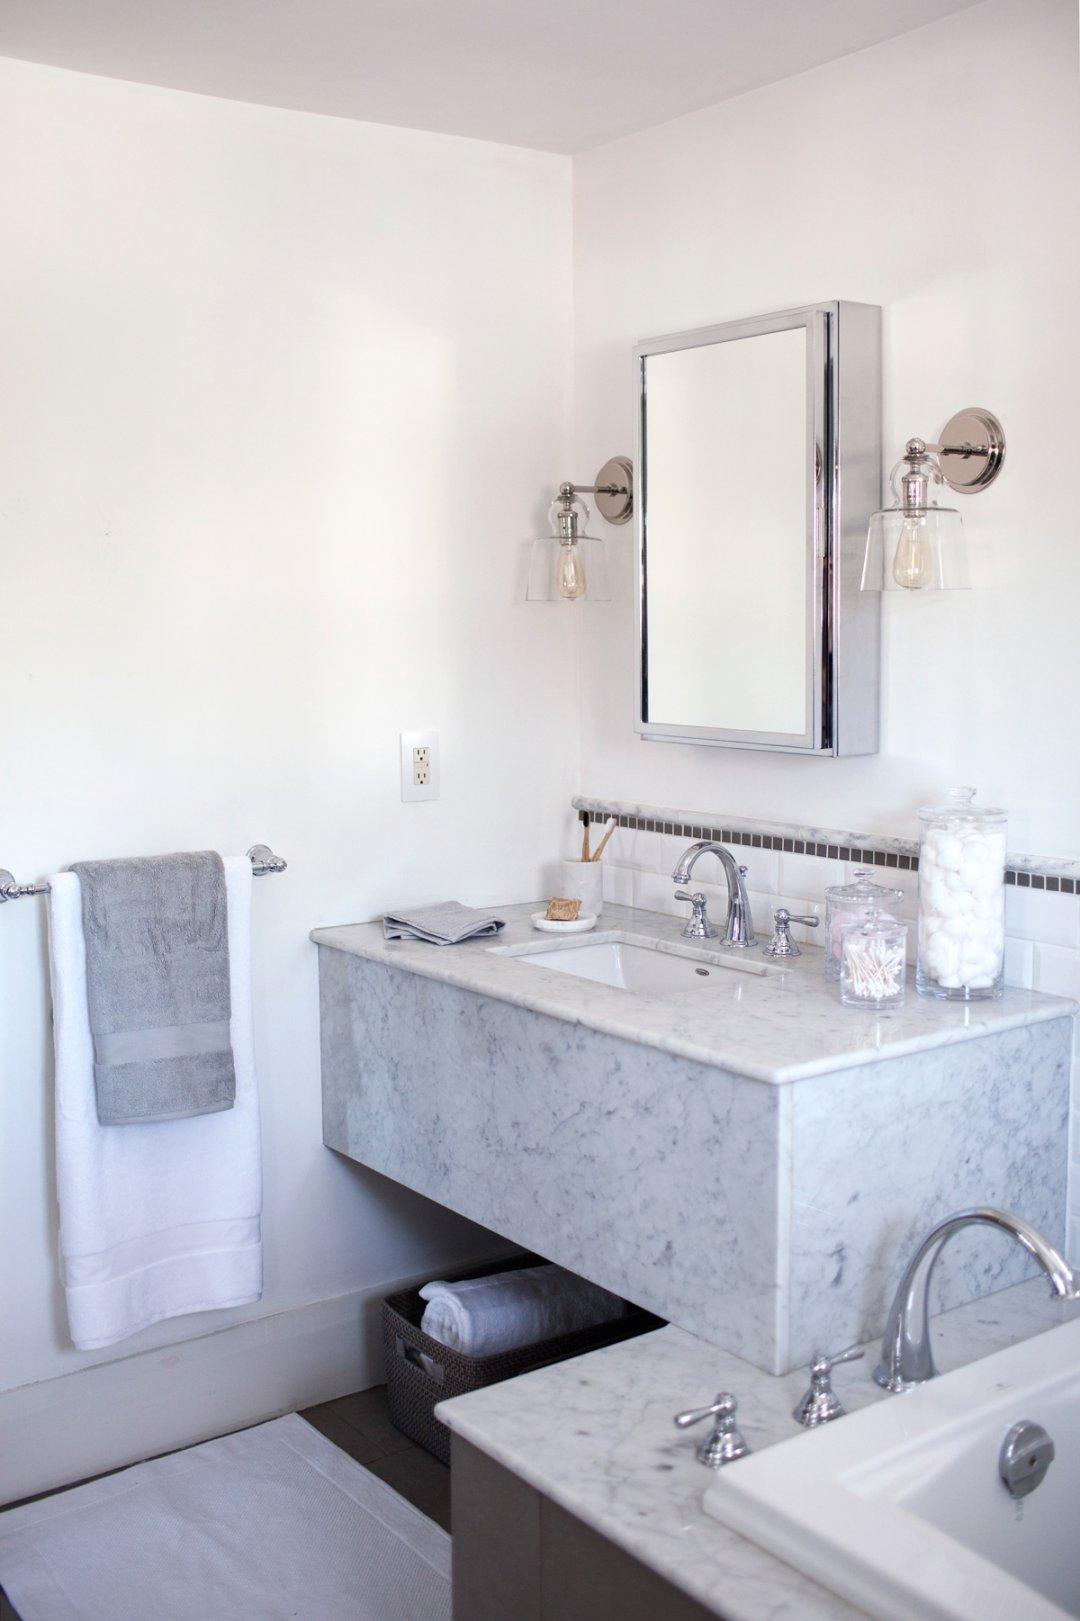 Diy Bathroom Ideas The Crate And Barrel Blog